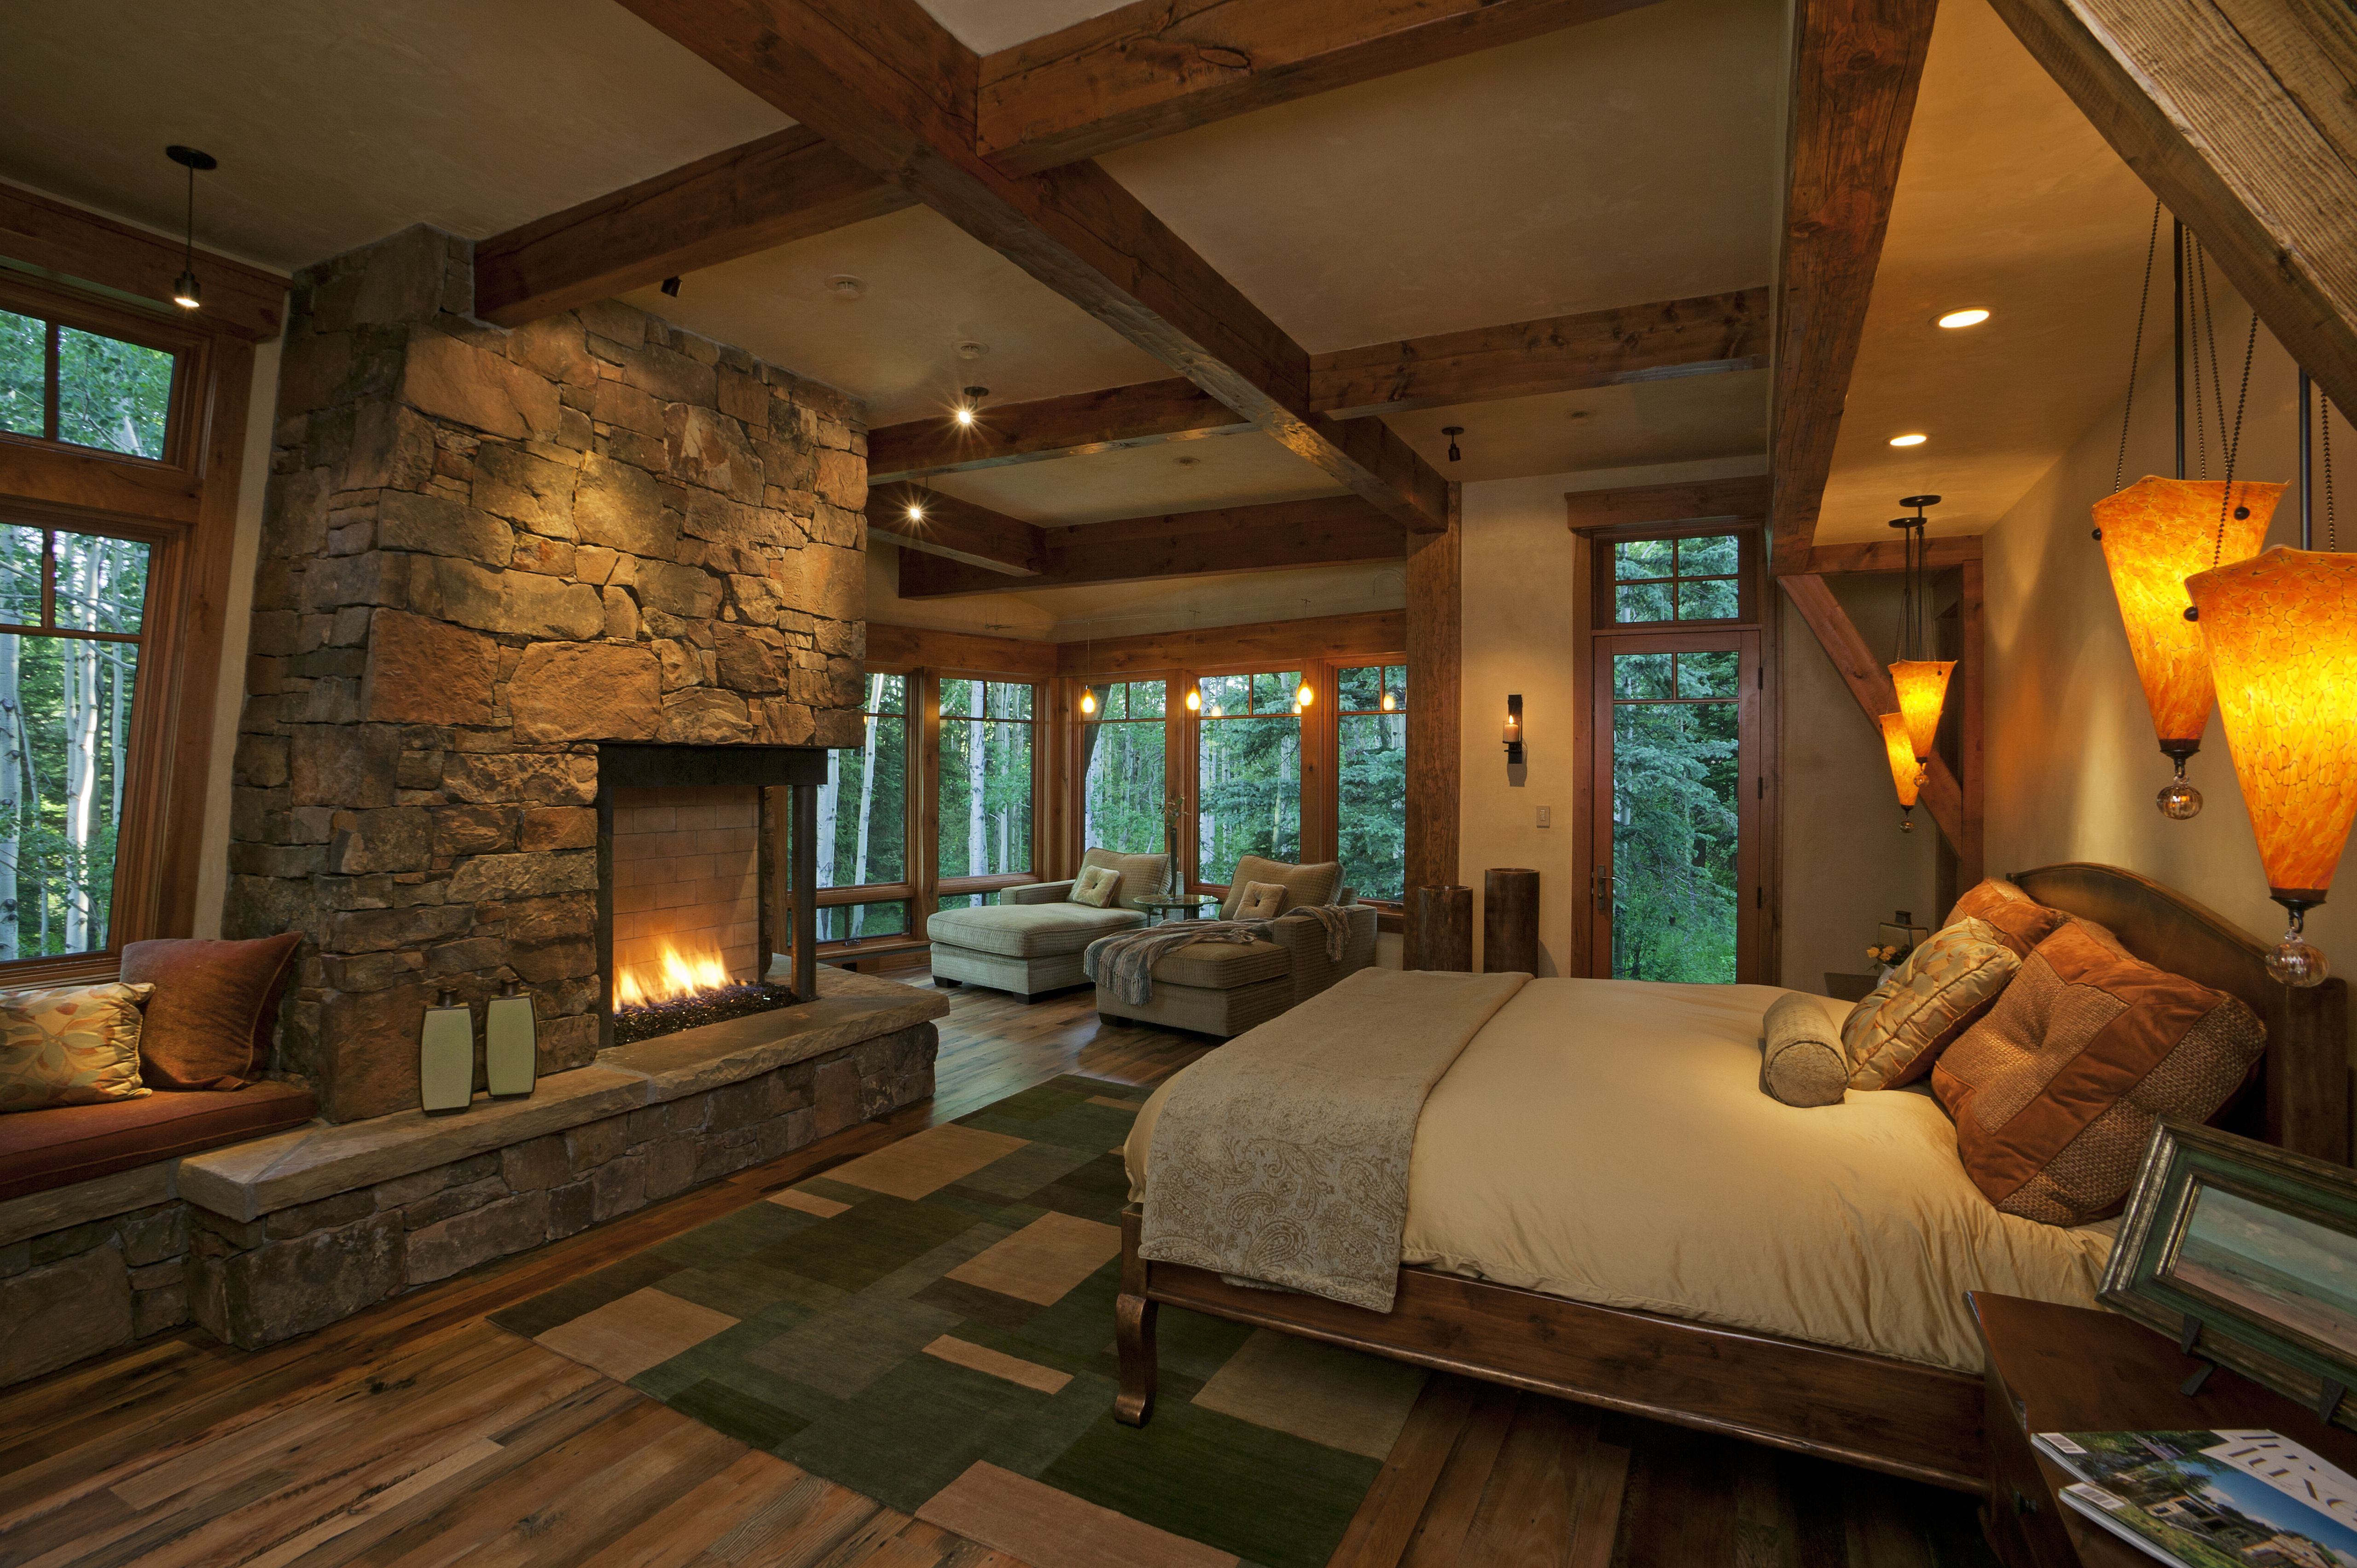 Romantisches schlafzimmer interieur kkkkkk  story  pinterest